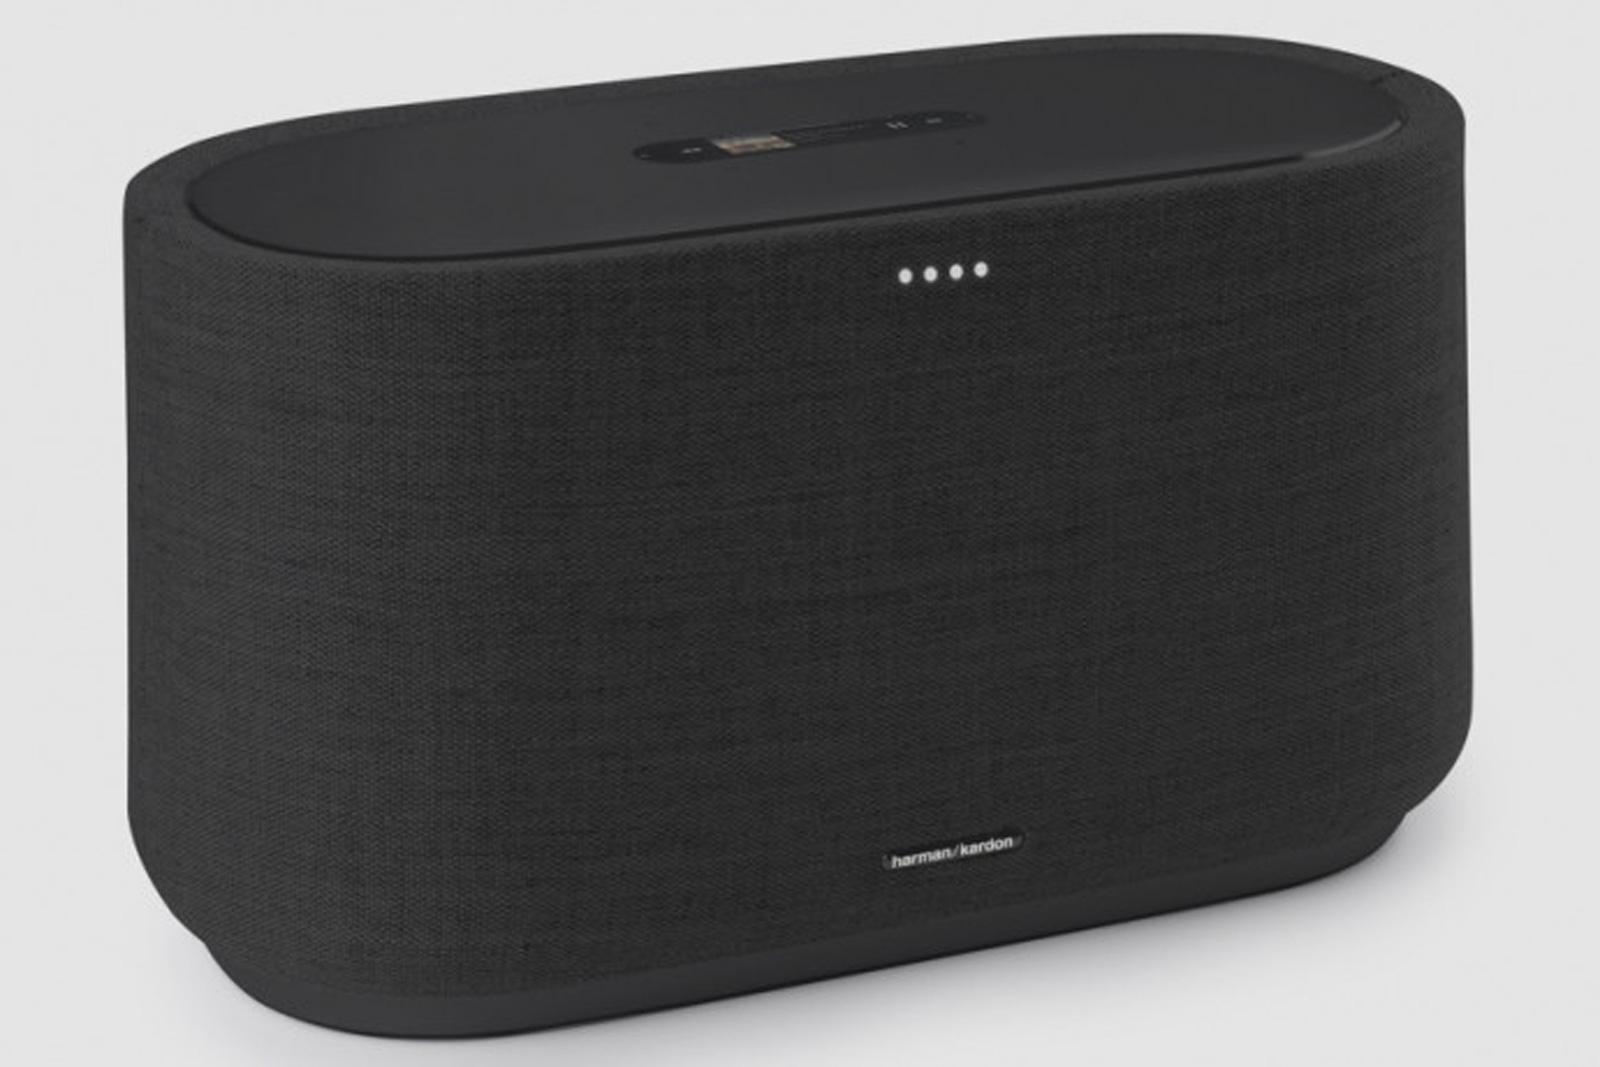 HarmanKardon展出新款智能音箱 可提供...